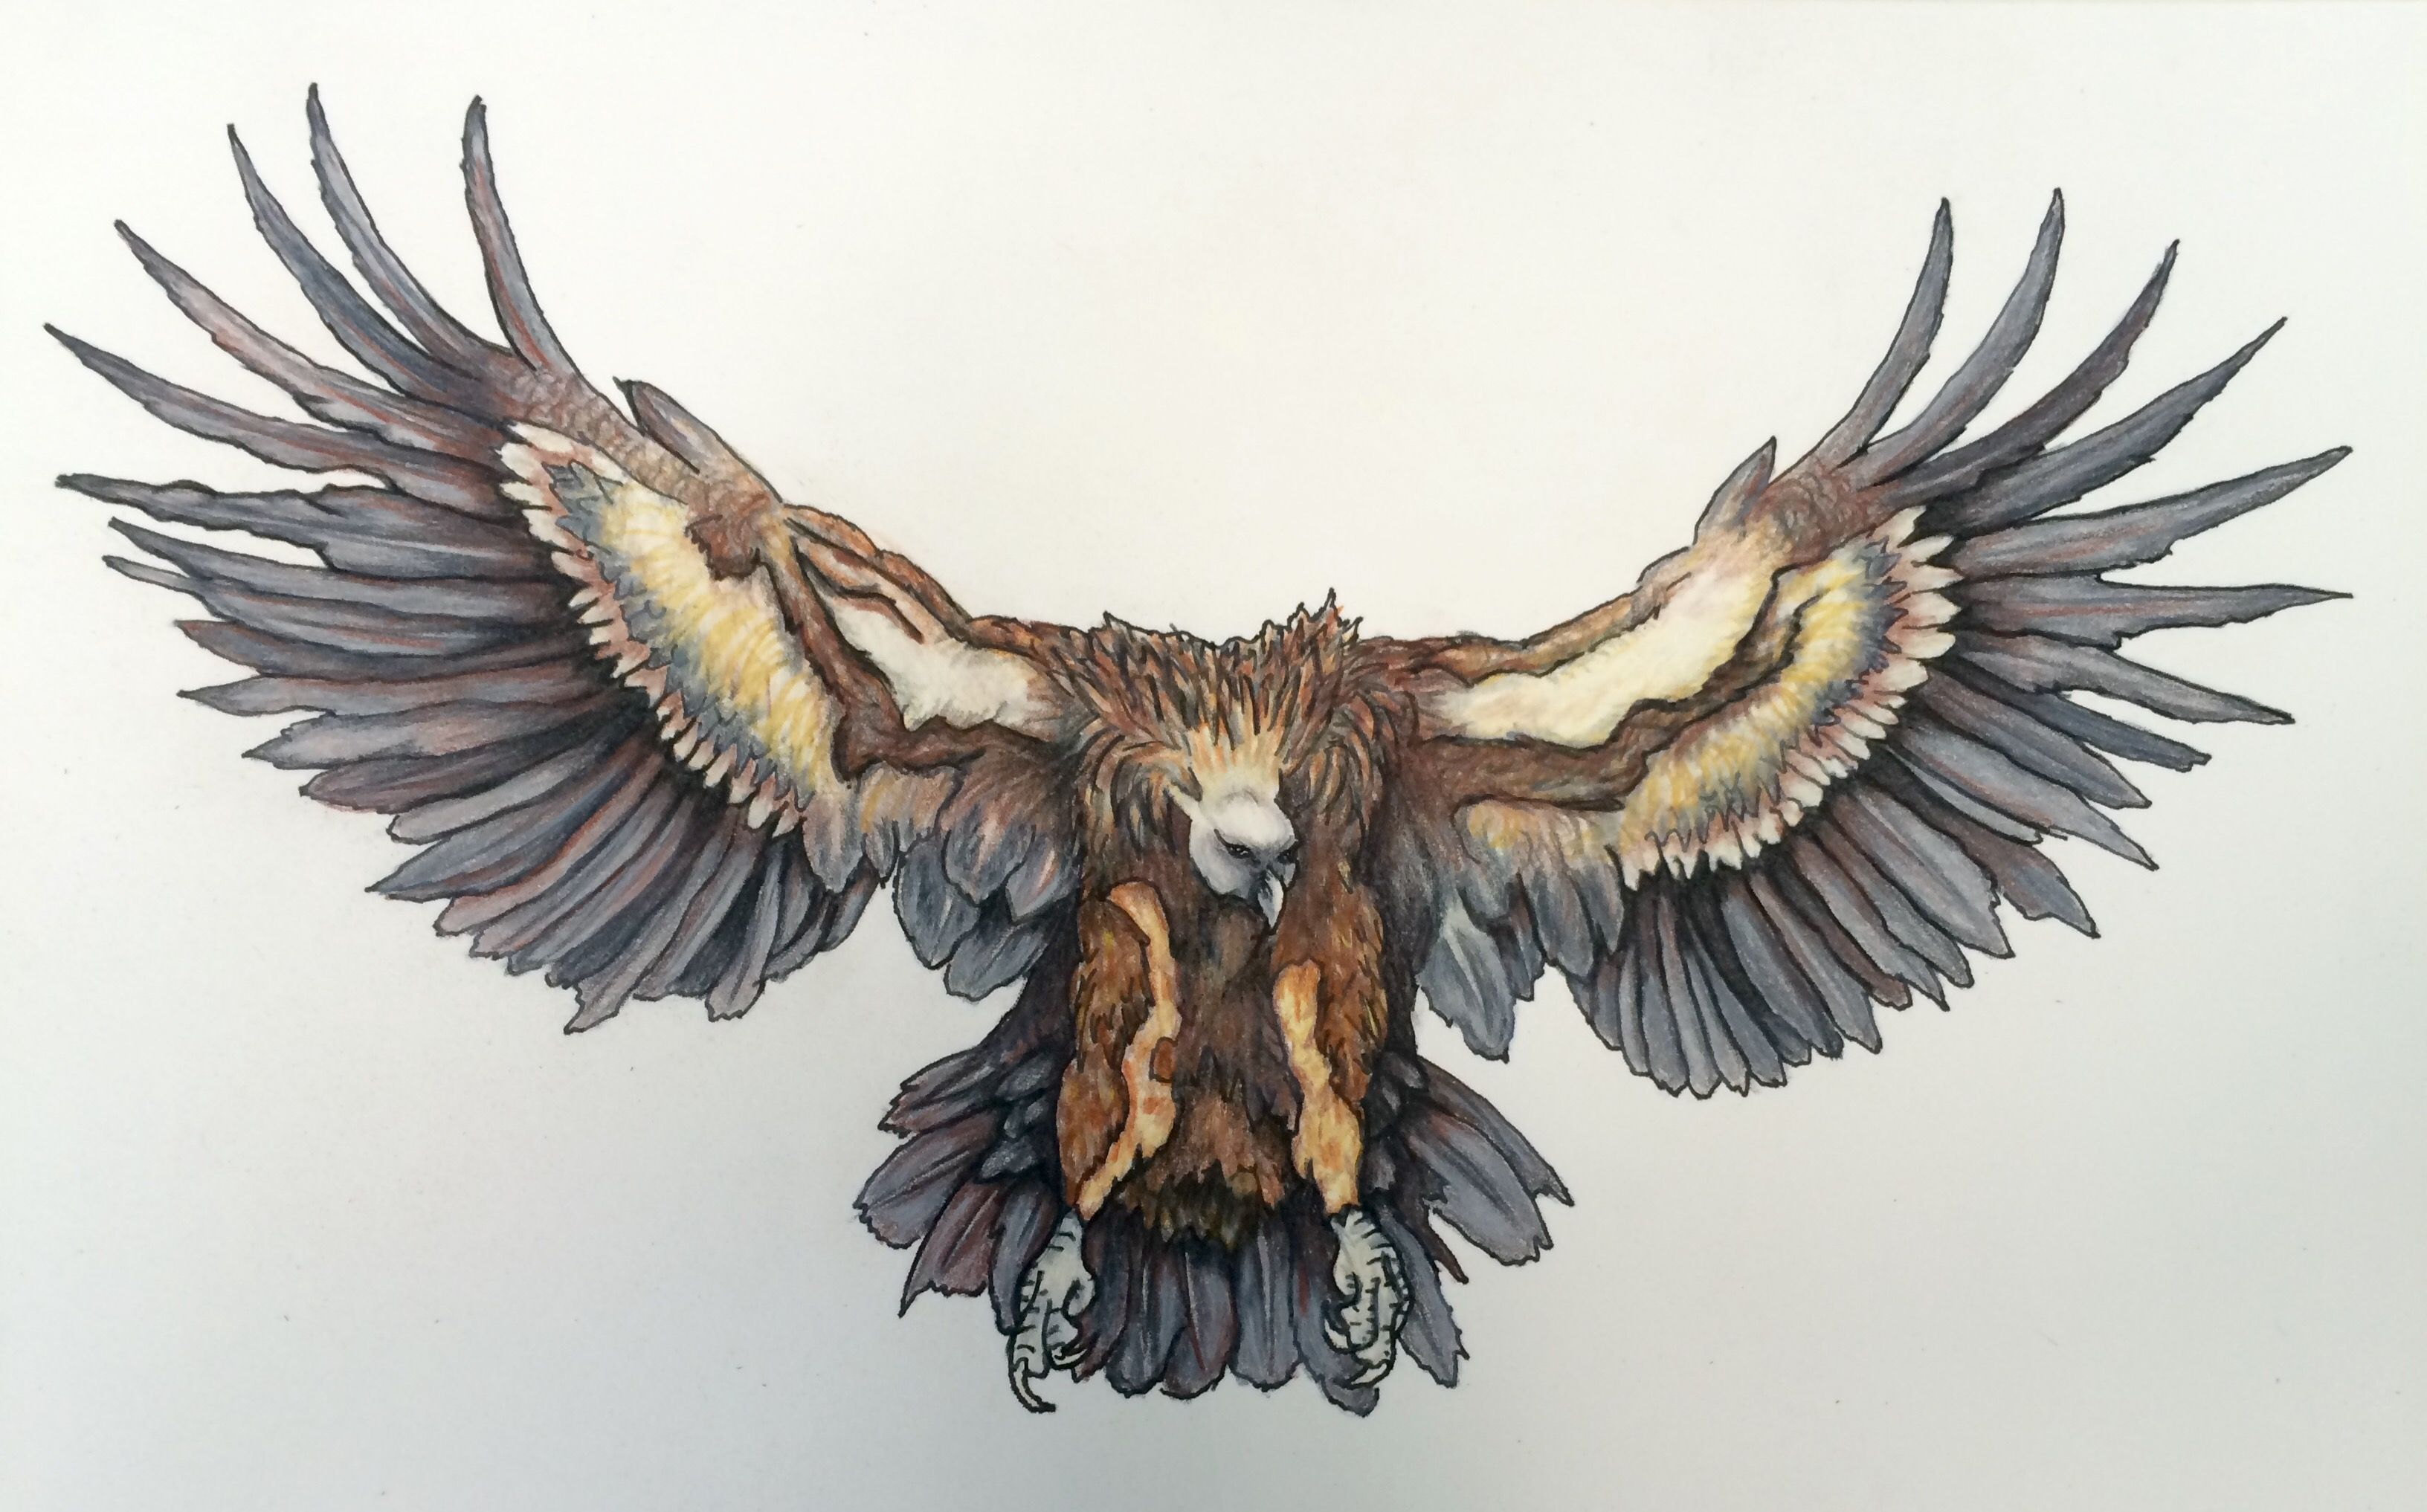 Griffon Vulture Tattoo Design S Lakin Hipster Tattoo Traditional Vulture Tattoo Art Tattoo